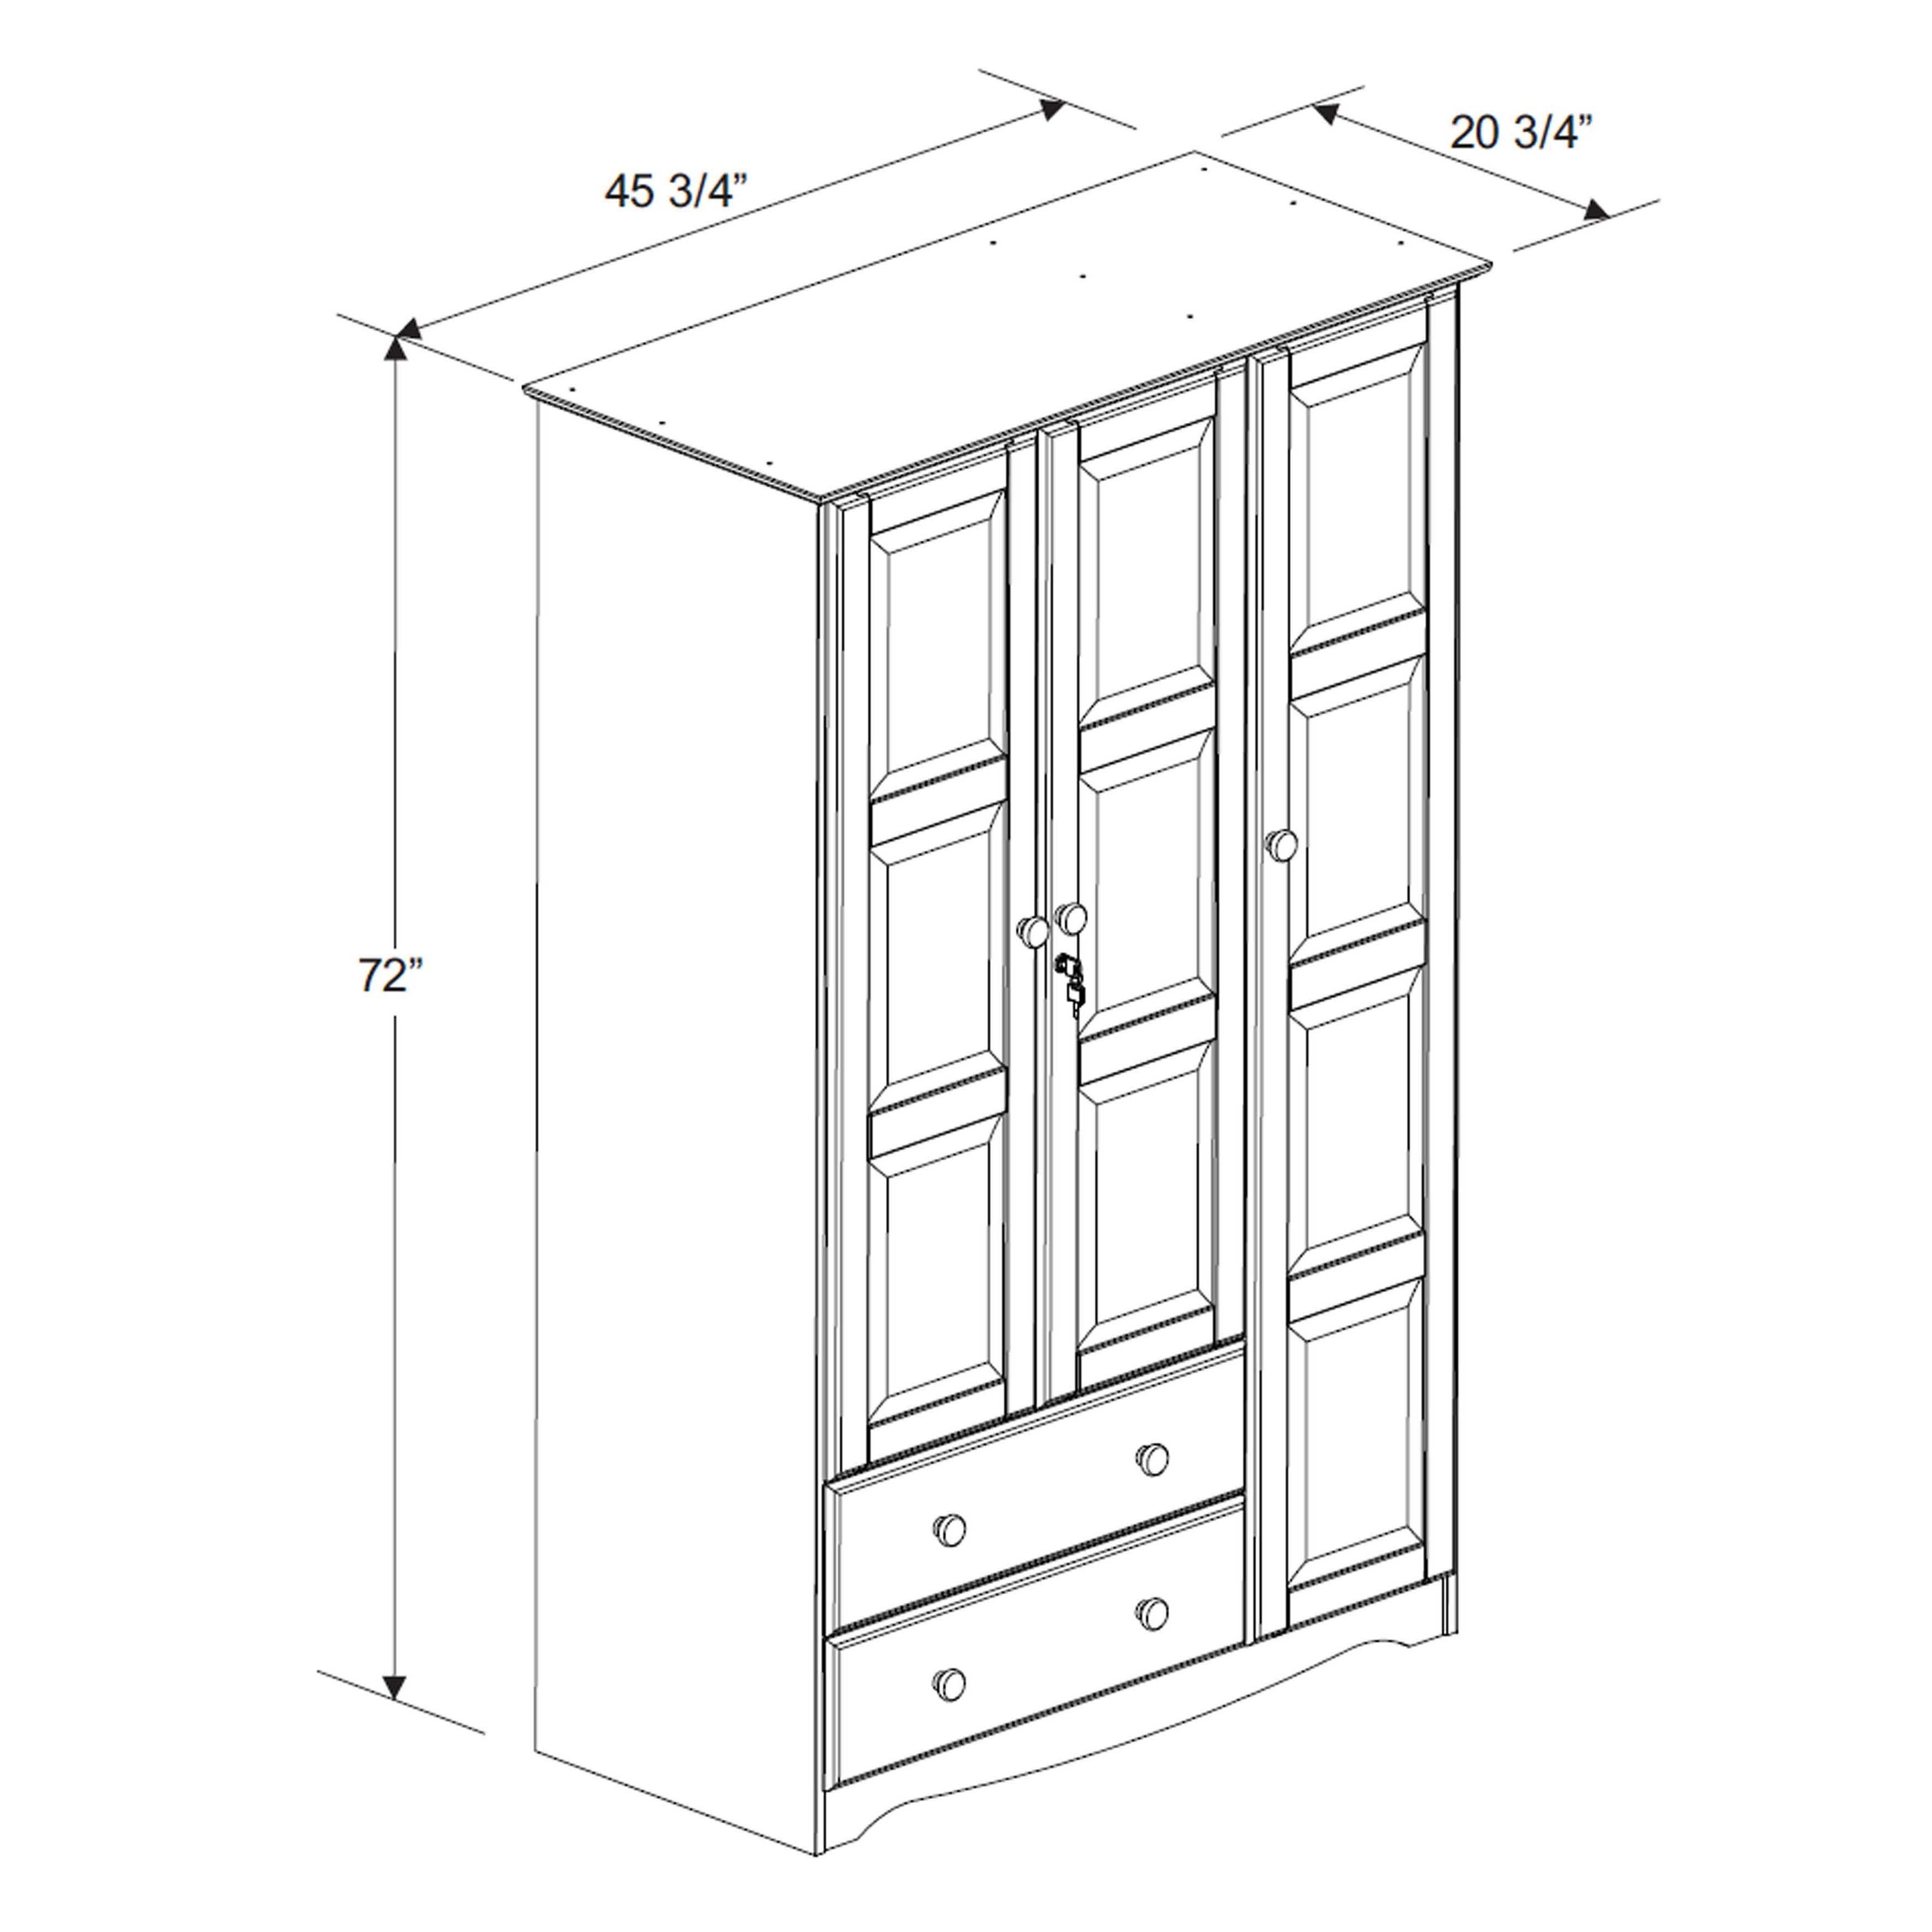 Lockable Bedroom Furniture Solid Wood Wardrobe Three Doors Lockable Storage Organize Bedroom